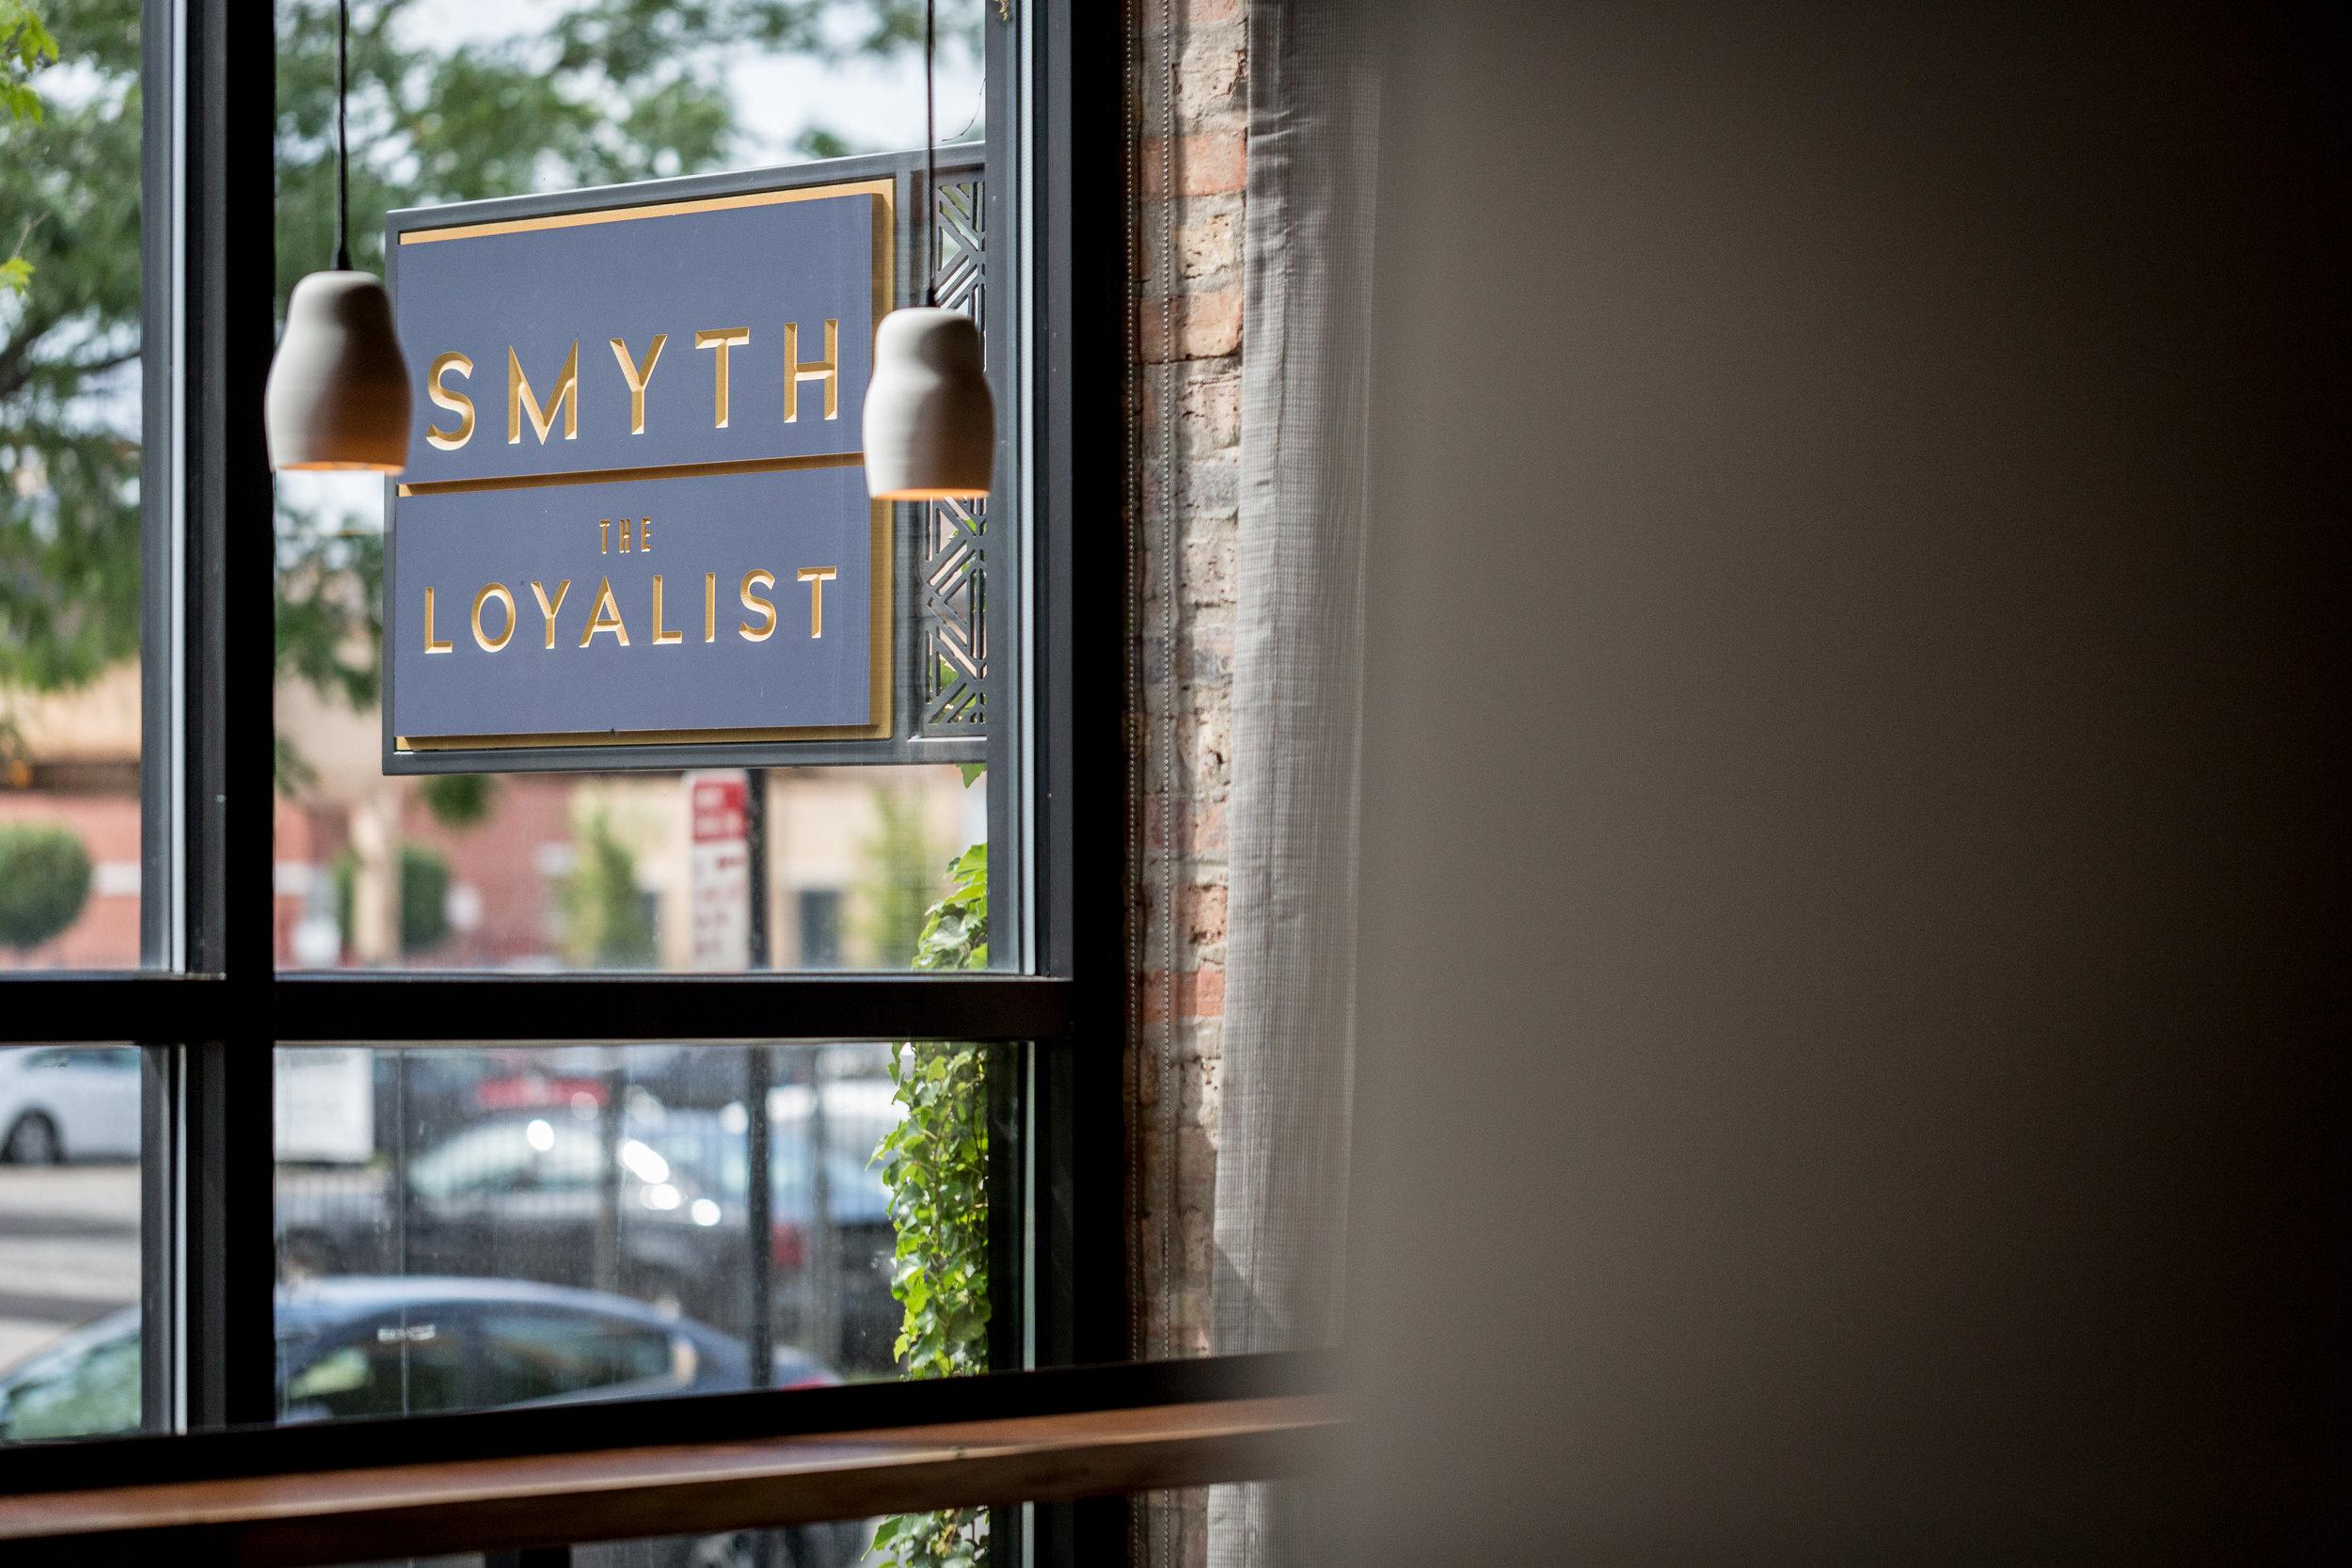 studio-saint-bars-and-restaurants-smyth-and-the-loyalist-washington-dc-7